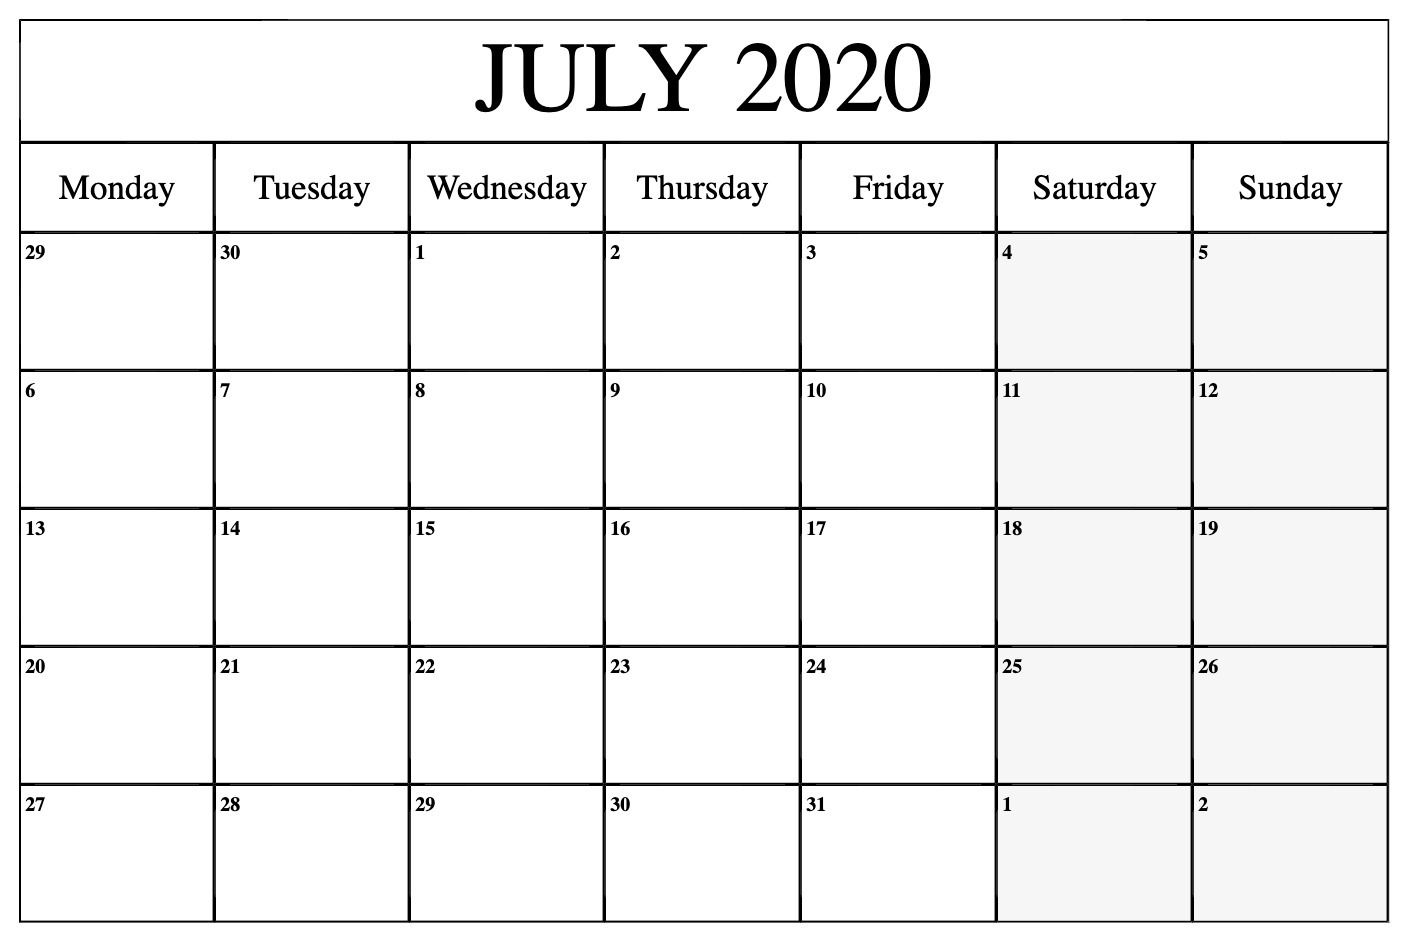 Free July 2020 Calendar Editable Blank Template In 2020